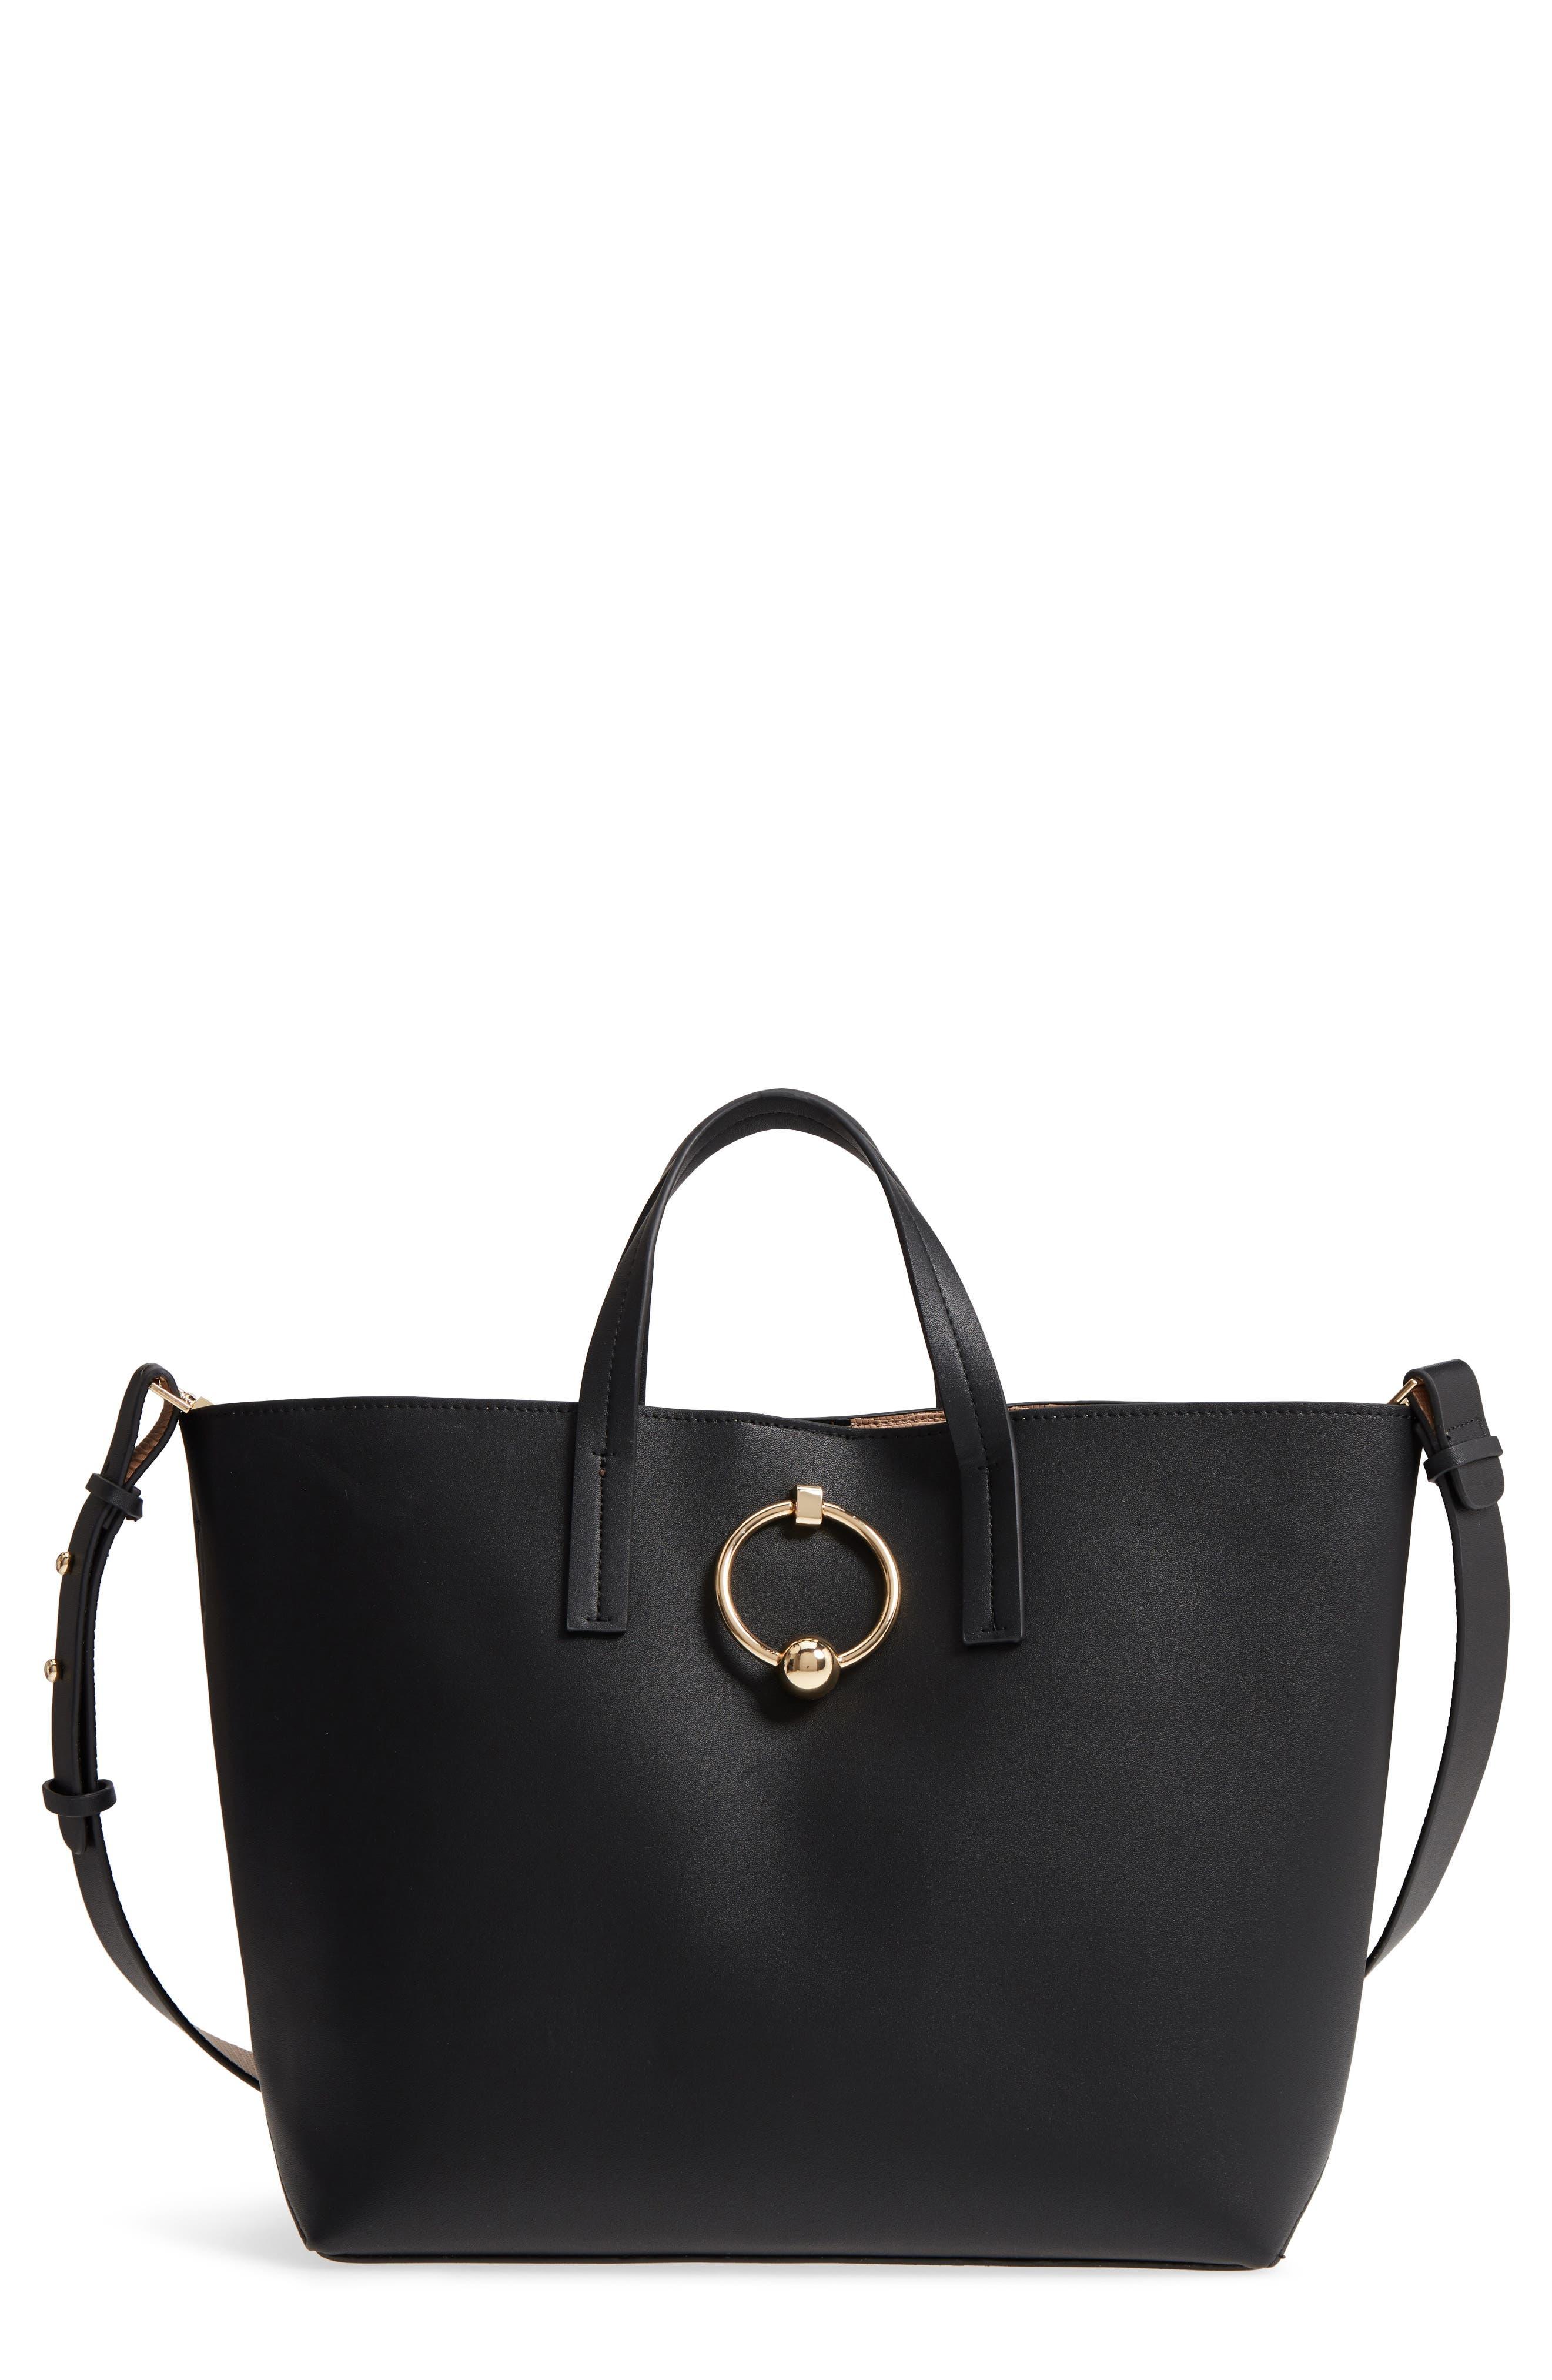 Seline Tote Bag,                         Main,                         color, 001